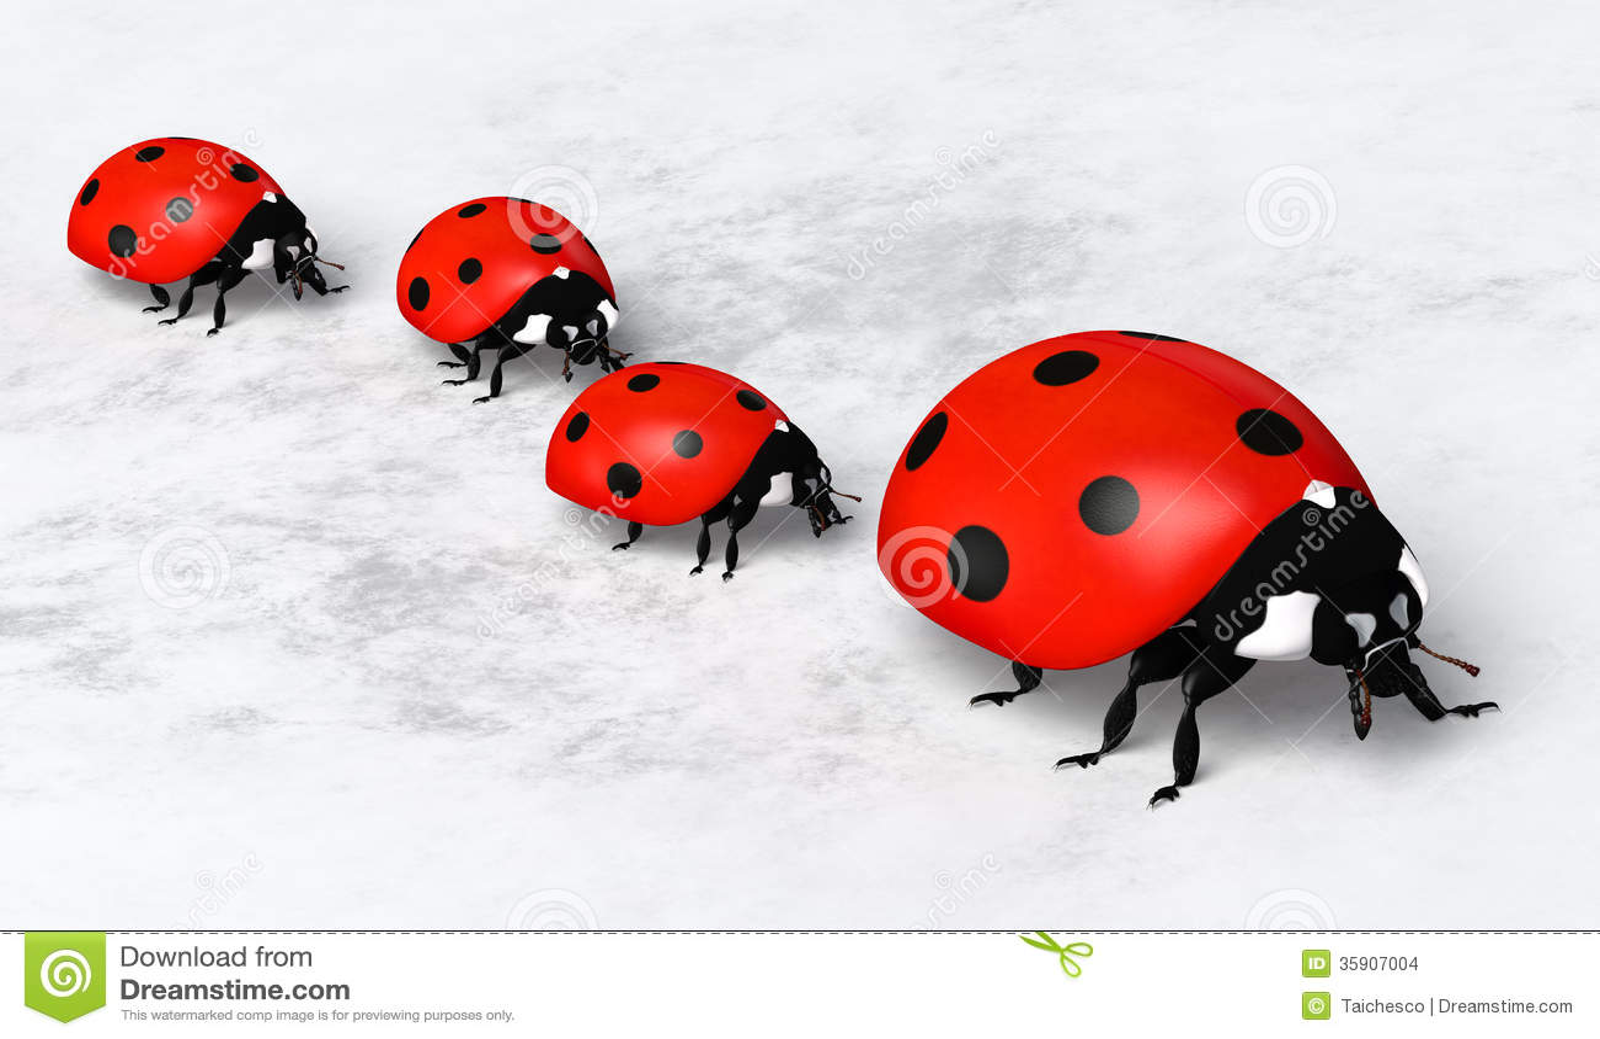 The ladybirds the wild wild world of jayne mansfield 2